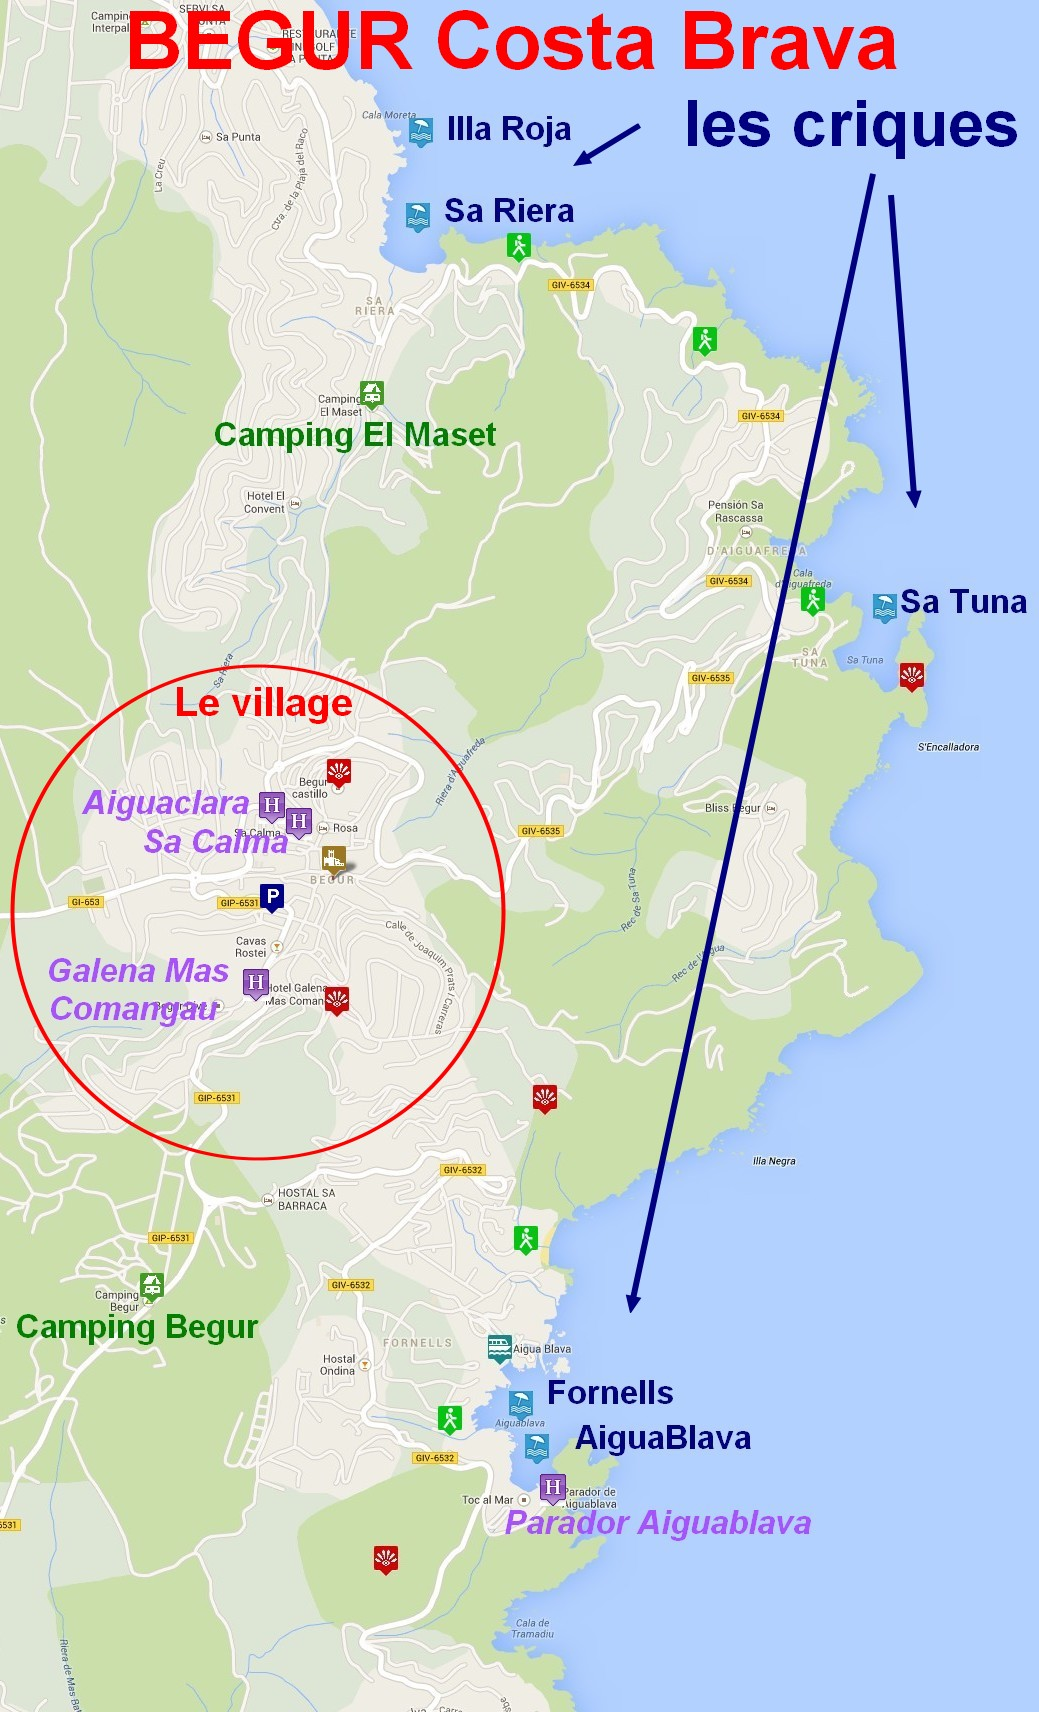 Carte Espagne Costa Brava Blanes.Carte Begur Espagne Costa Brava Criques Hotels Et Campings